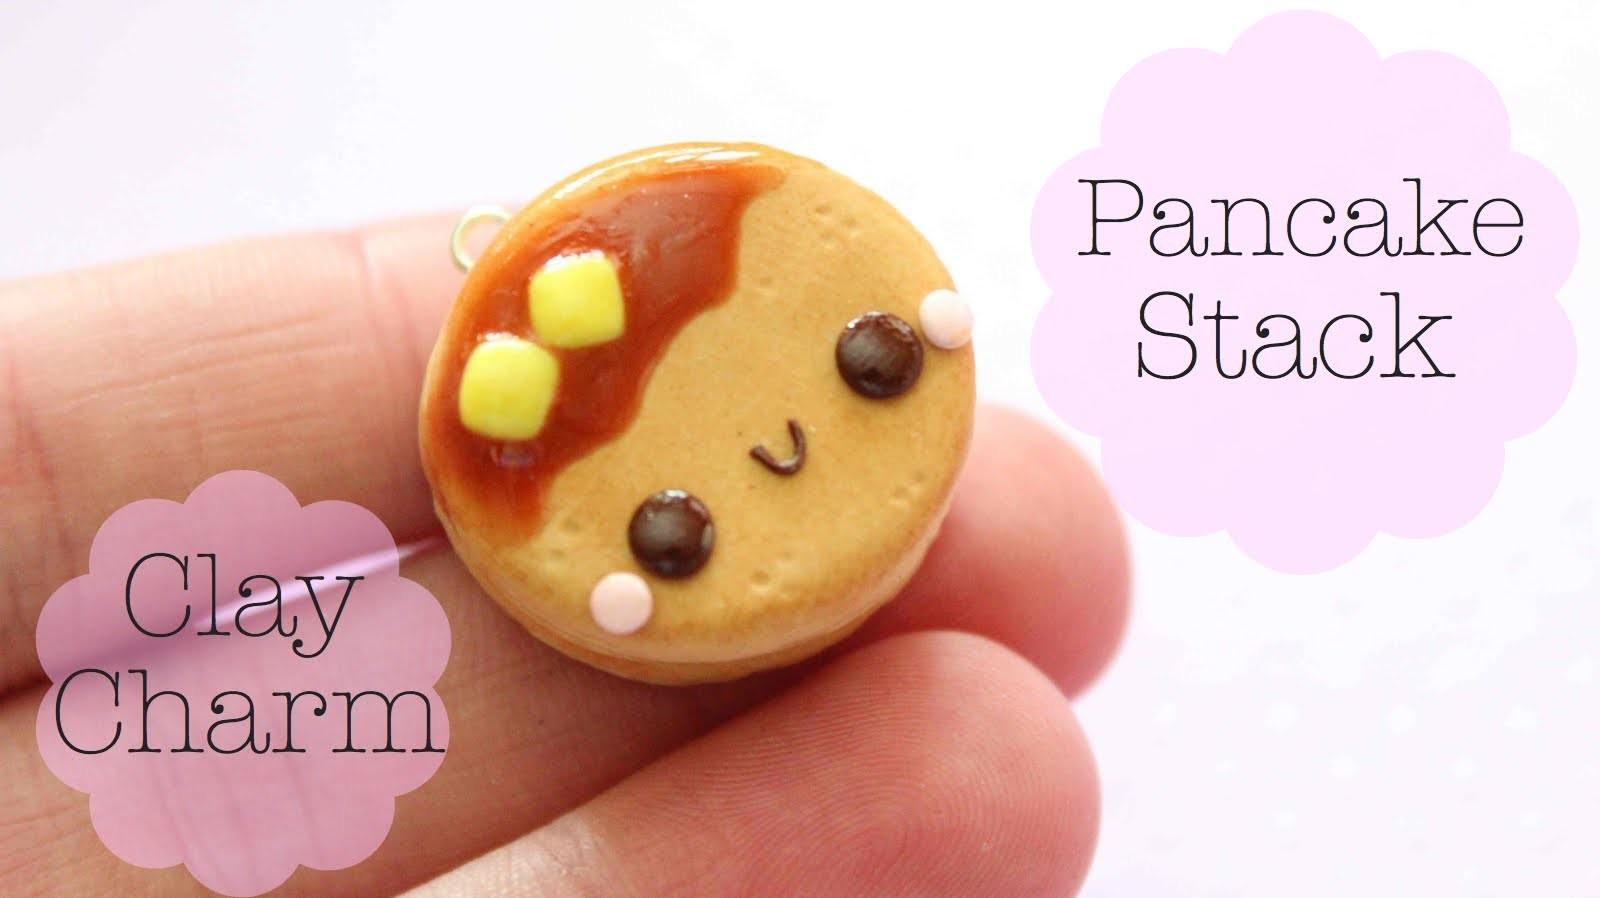 Polymer Clay Pancake Stack Charm Tutorial